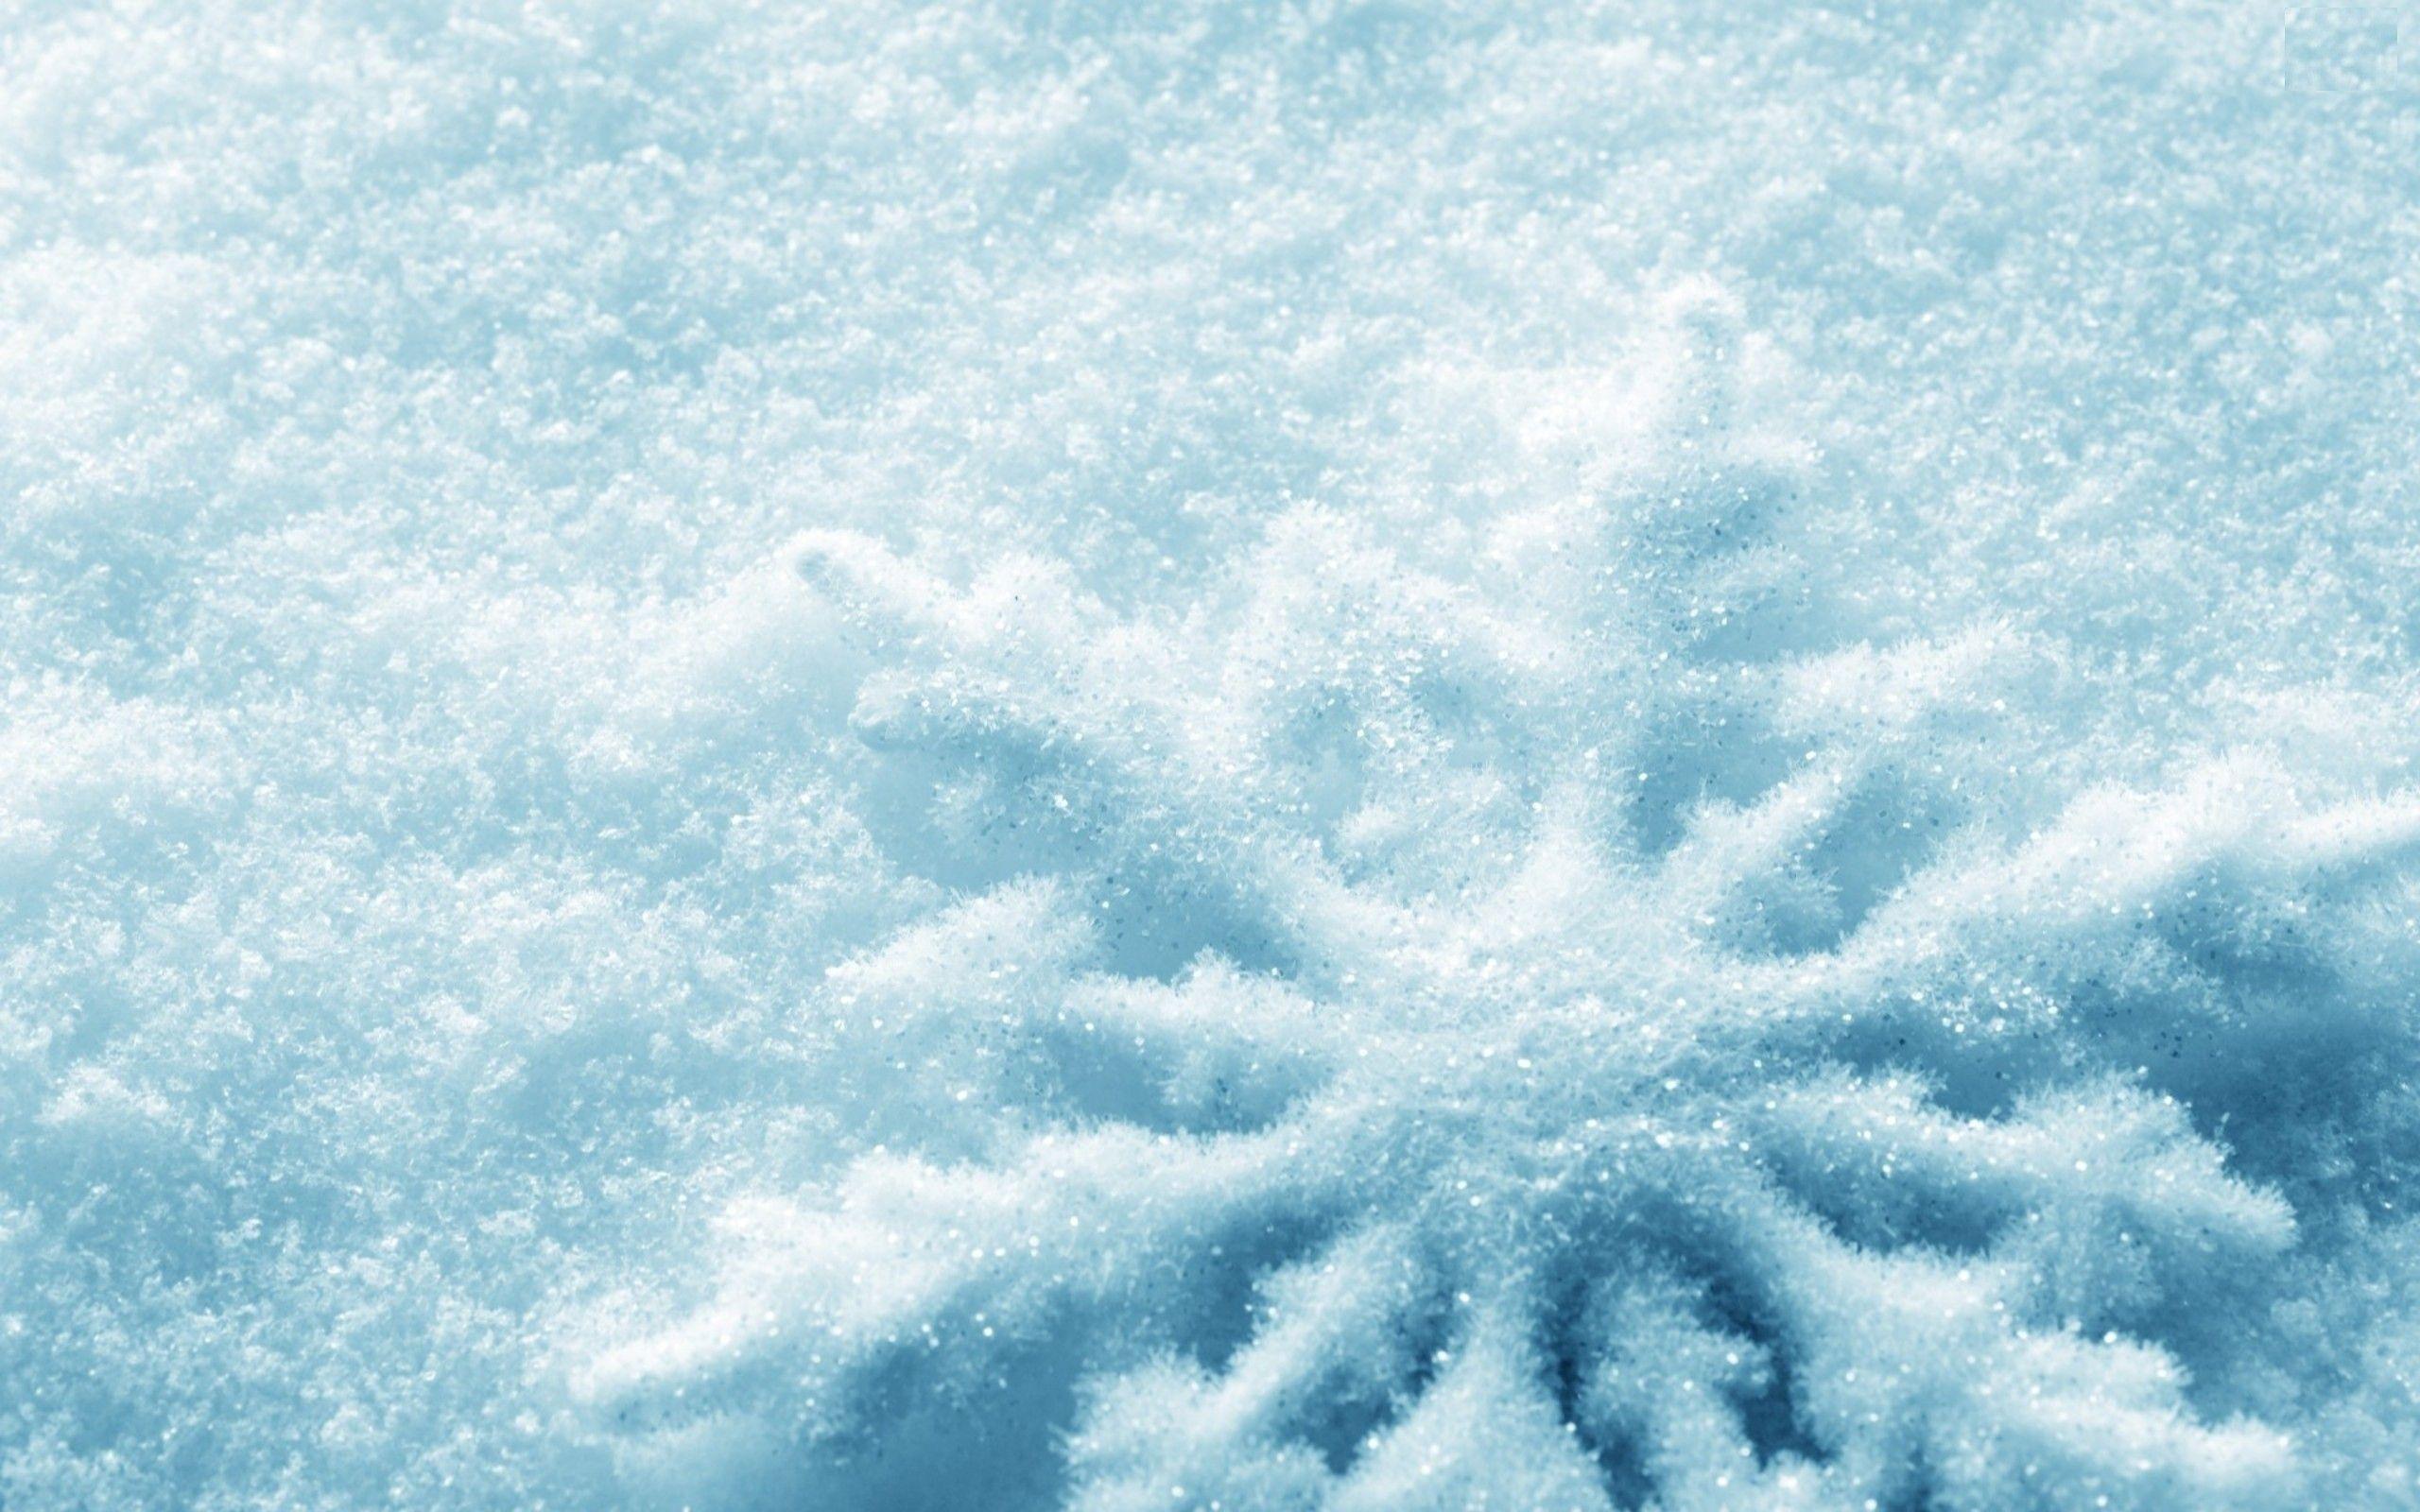 snow way hd wallpaper - photo #26